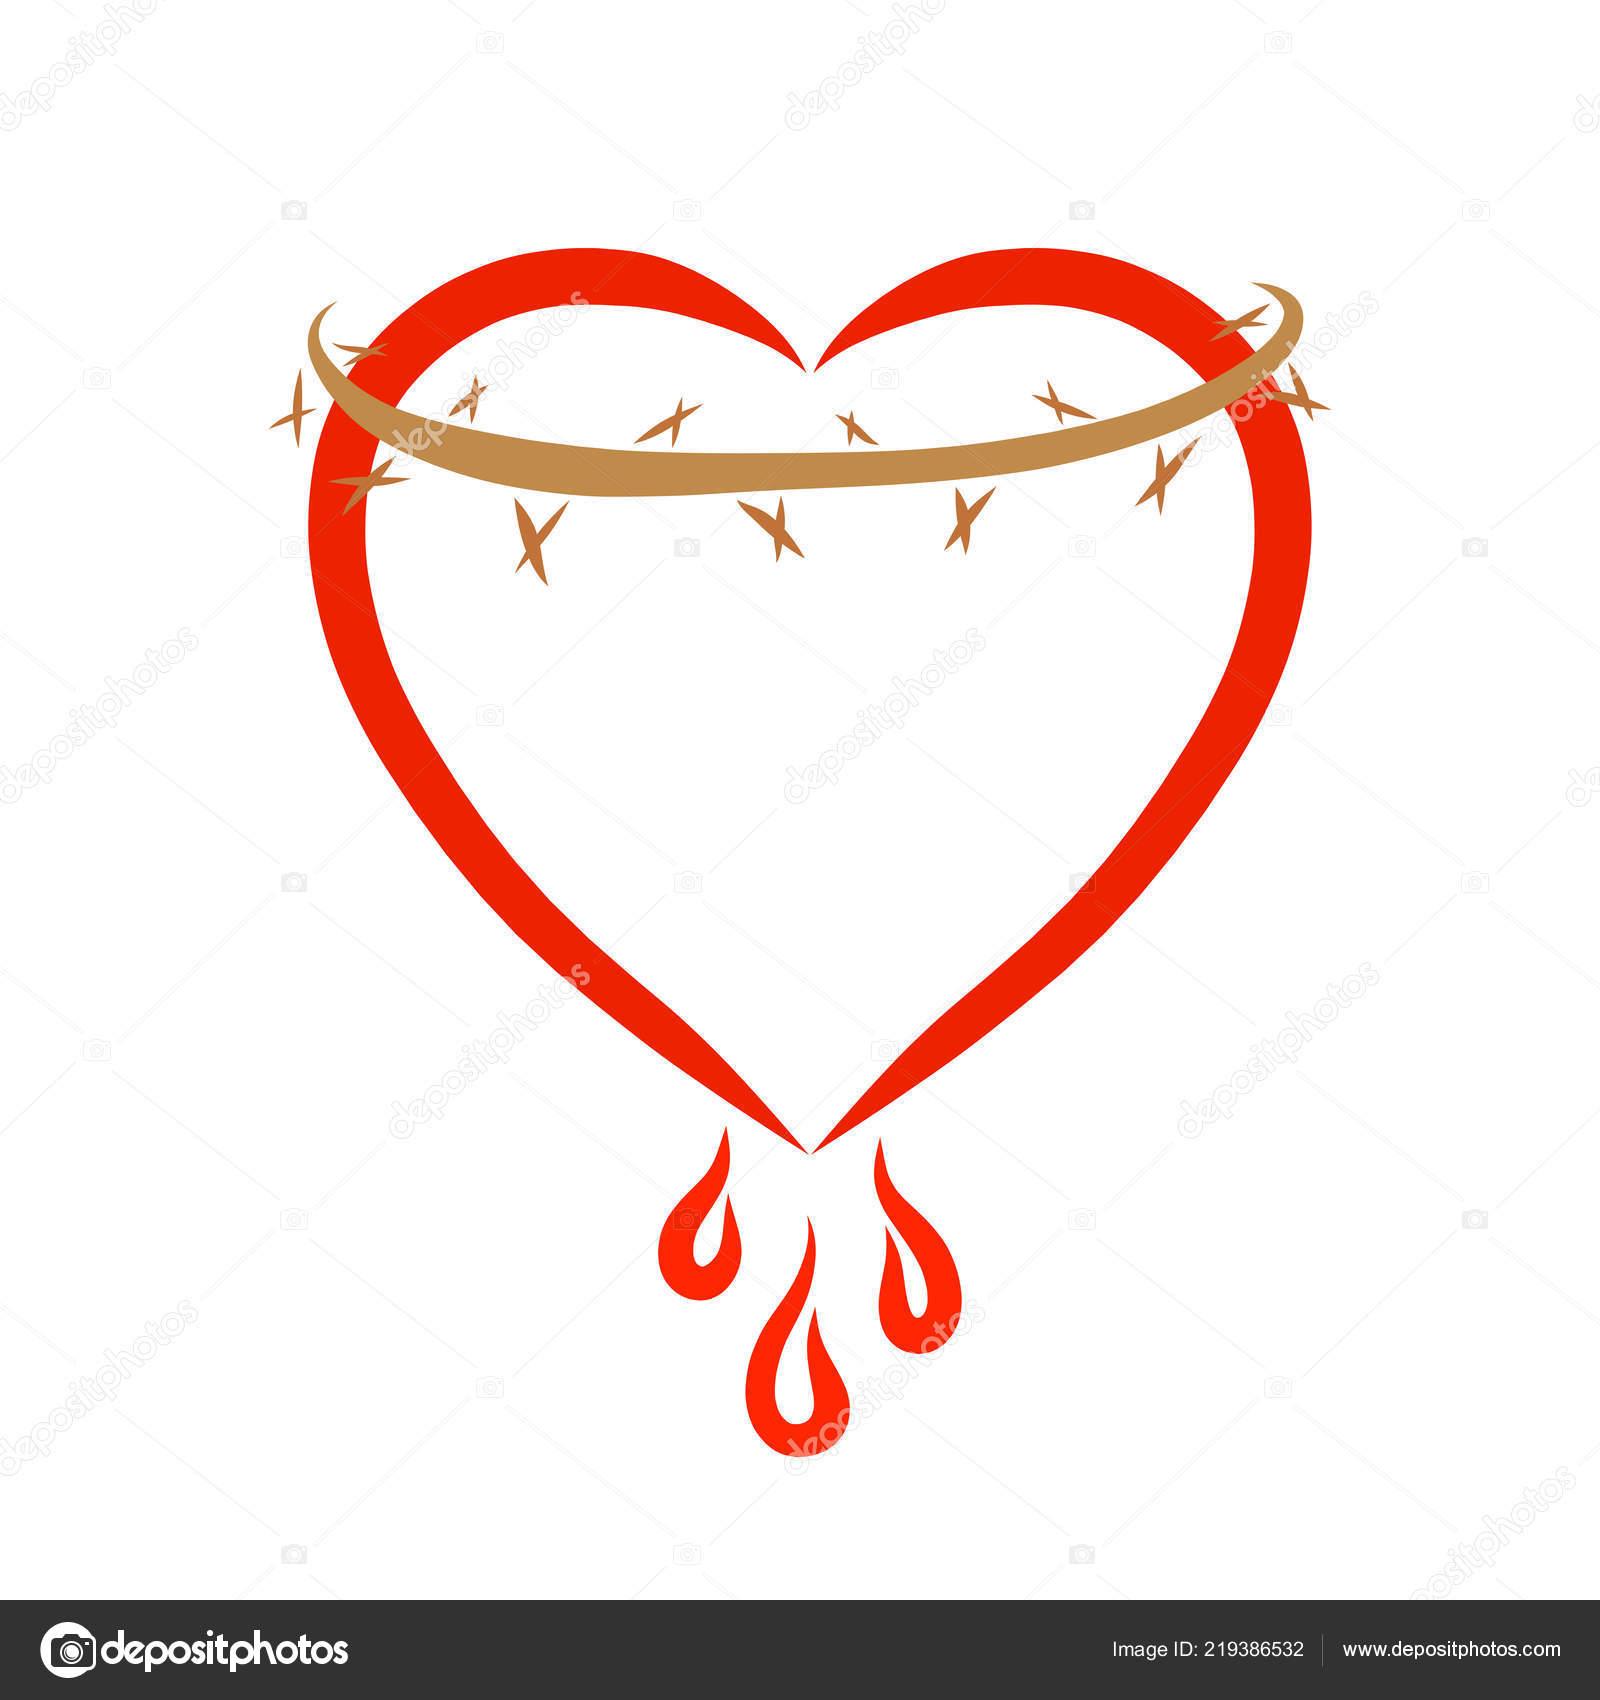 Heart Crown Thorns Drops Blood Sacrifice Christ — Stock Photo